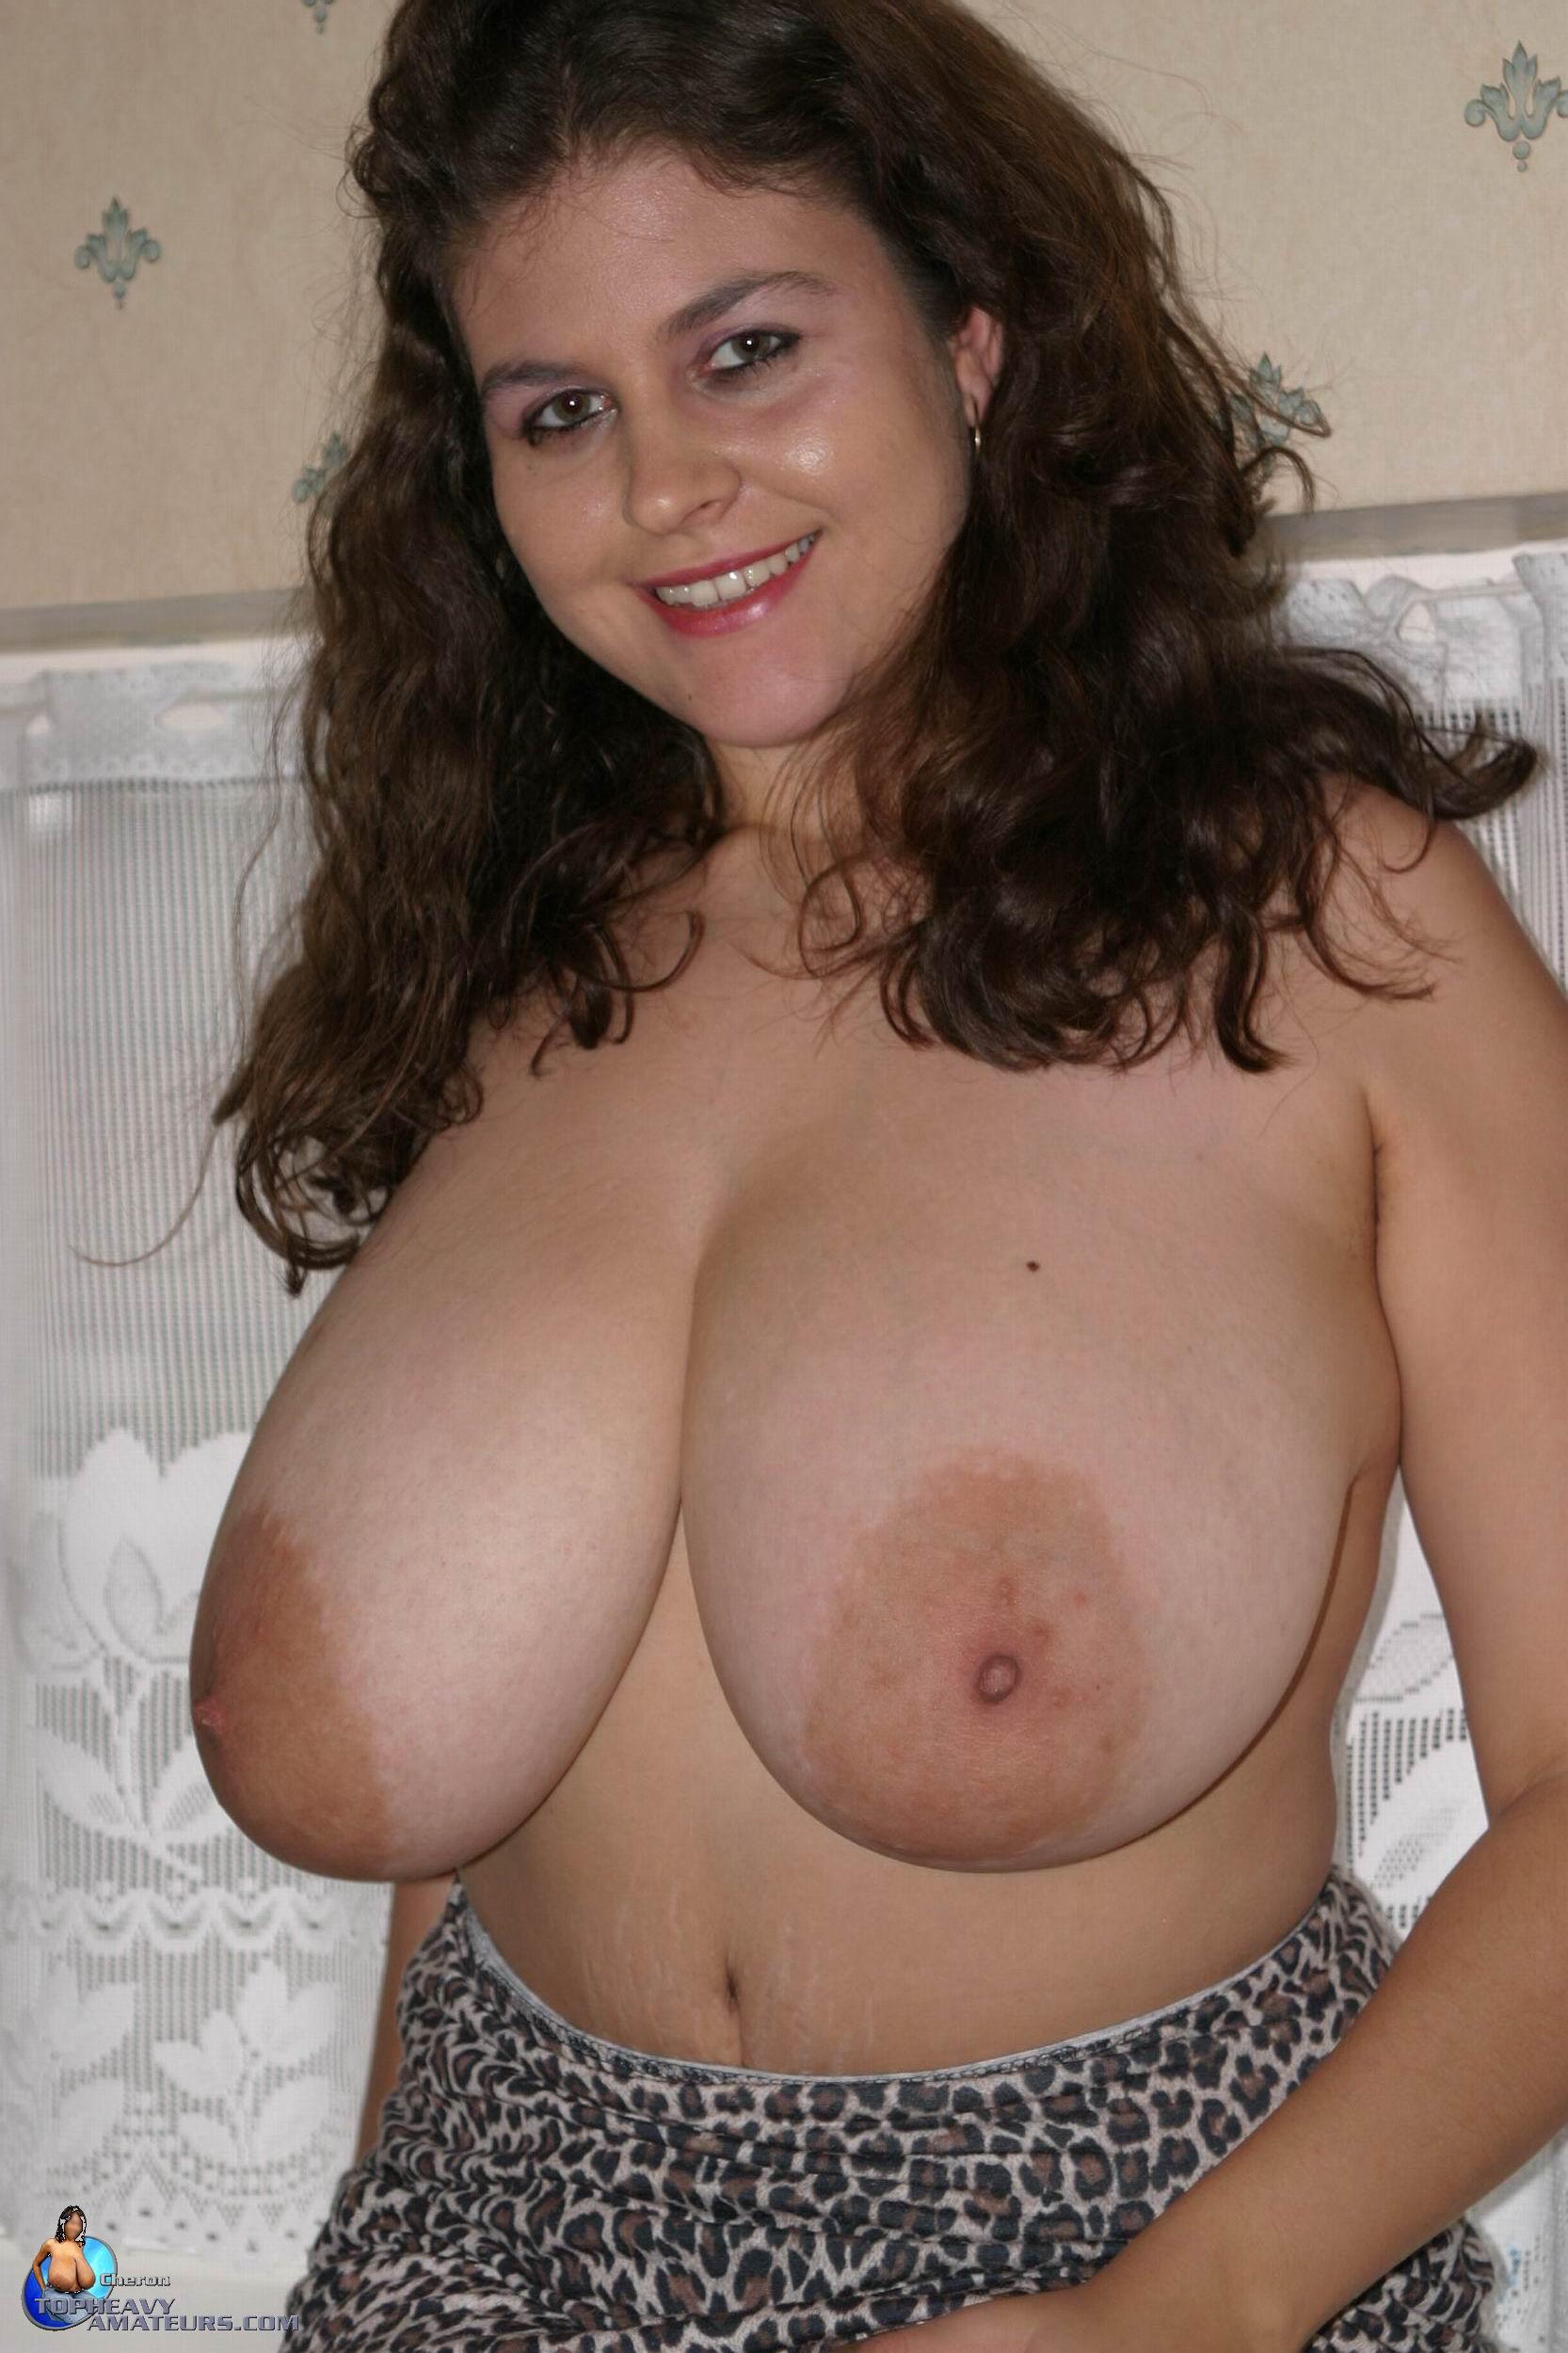 Best big tits photos